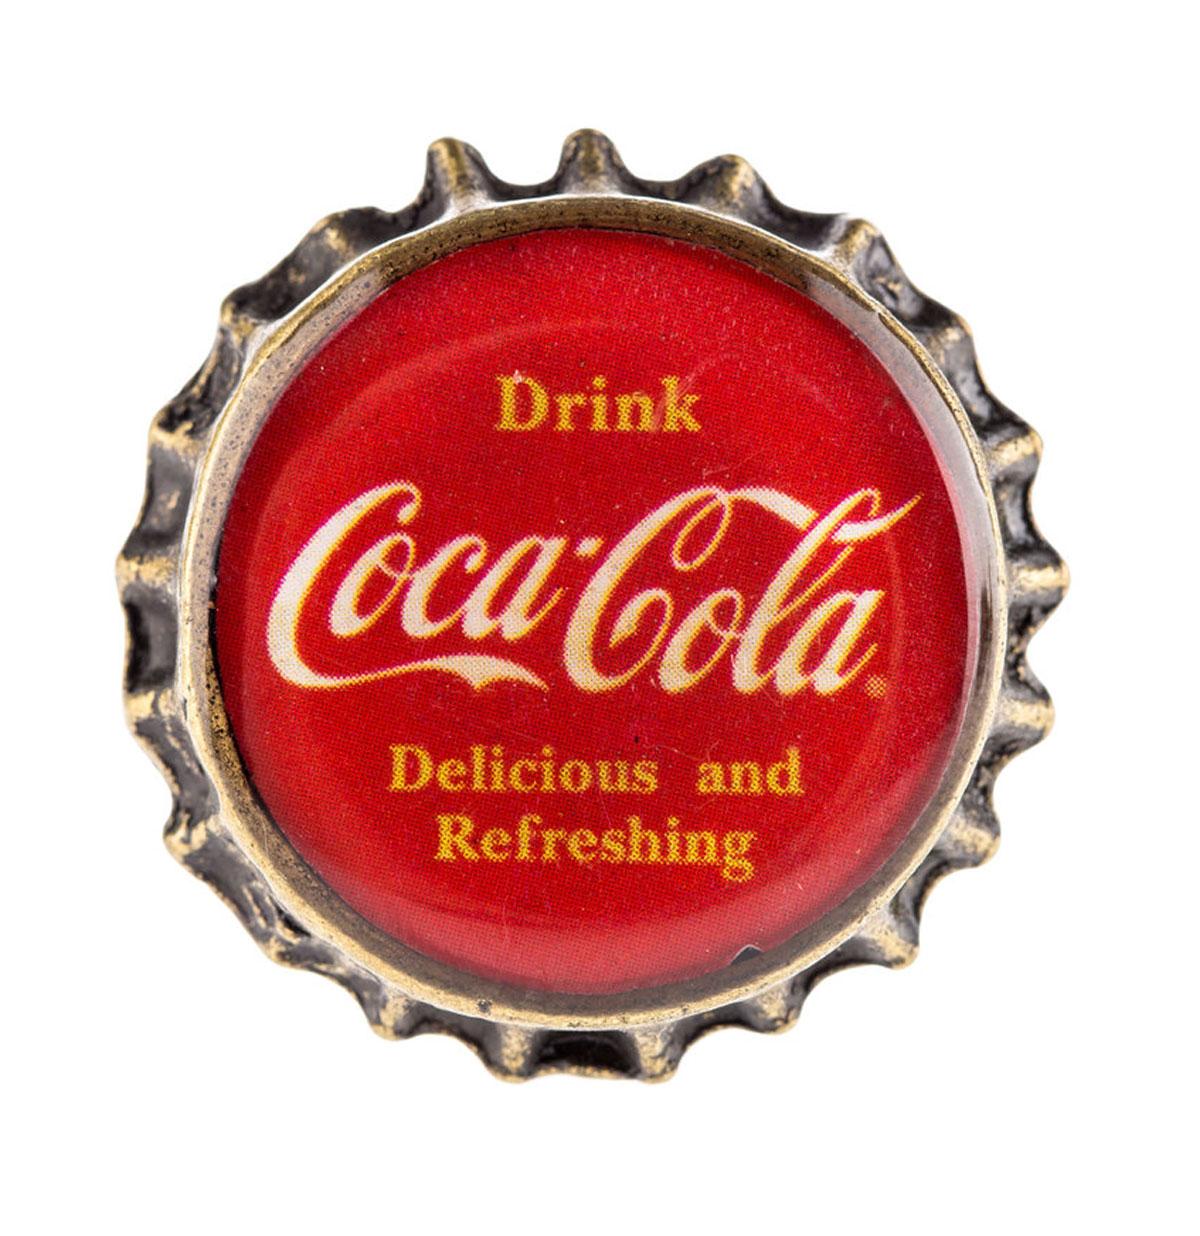 Coca-Cola Delicious & Refreshing Flessen Dop Kast - Lade Knop